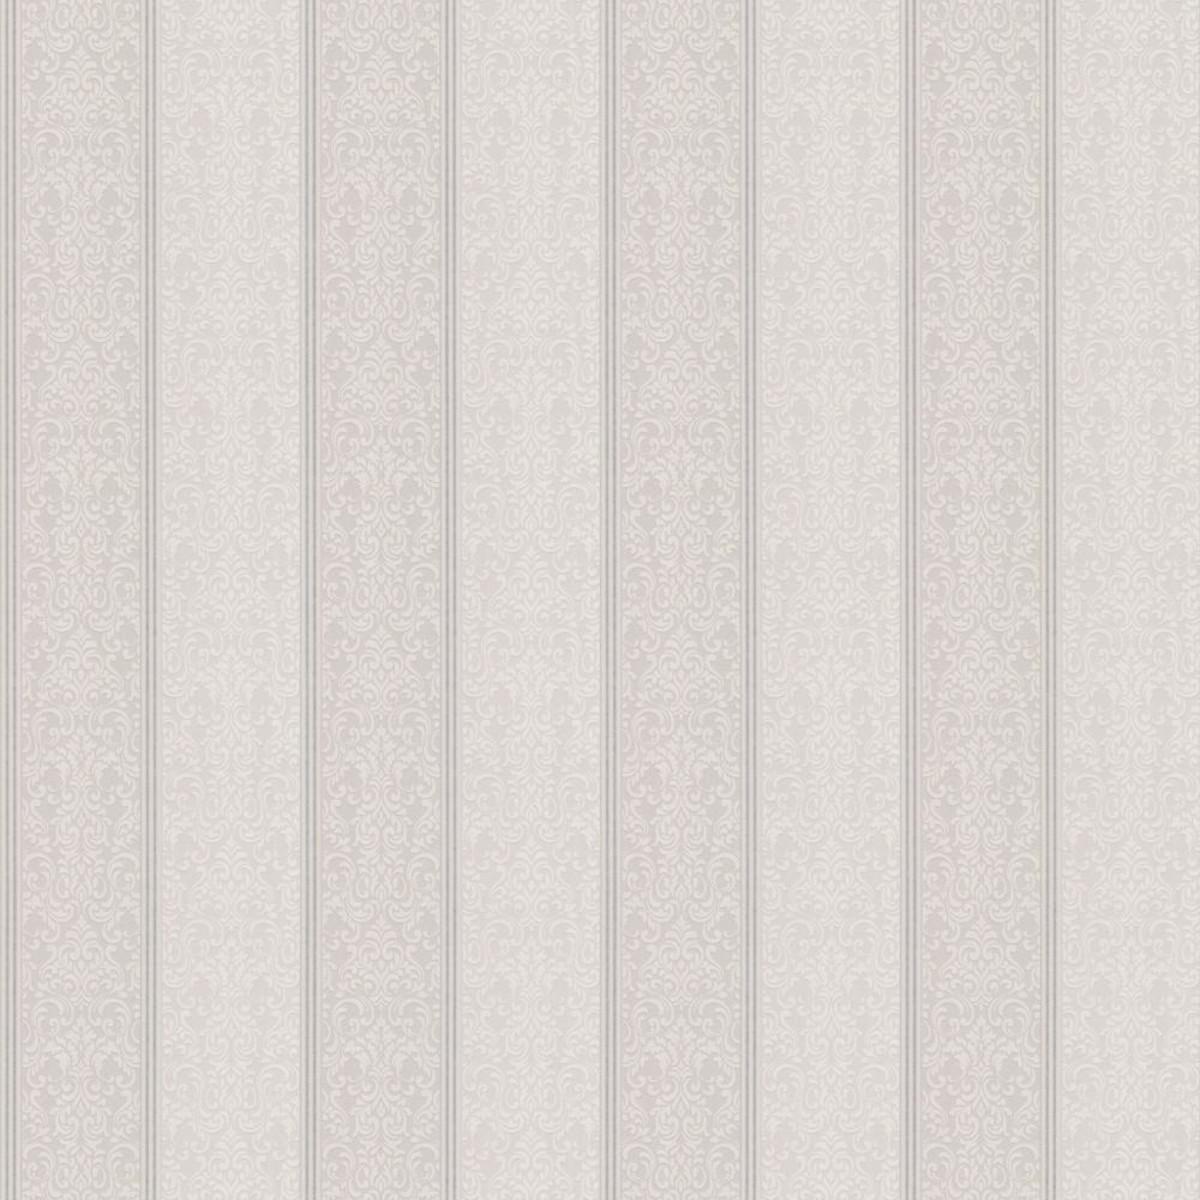 Обои виниловые Home Color Miln бежевые HC11020-14 0.53 м